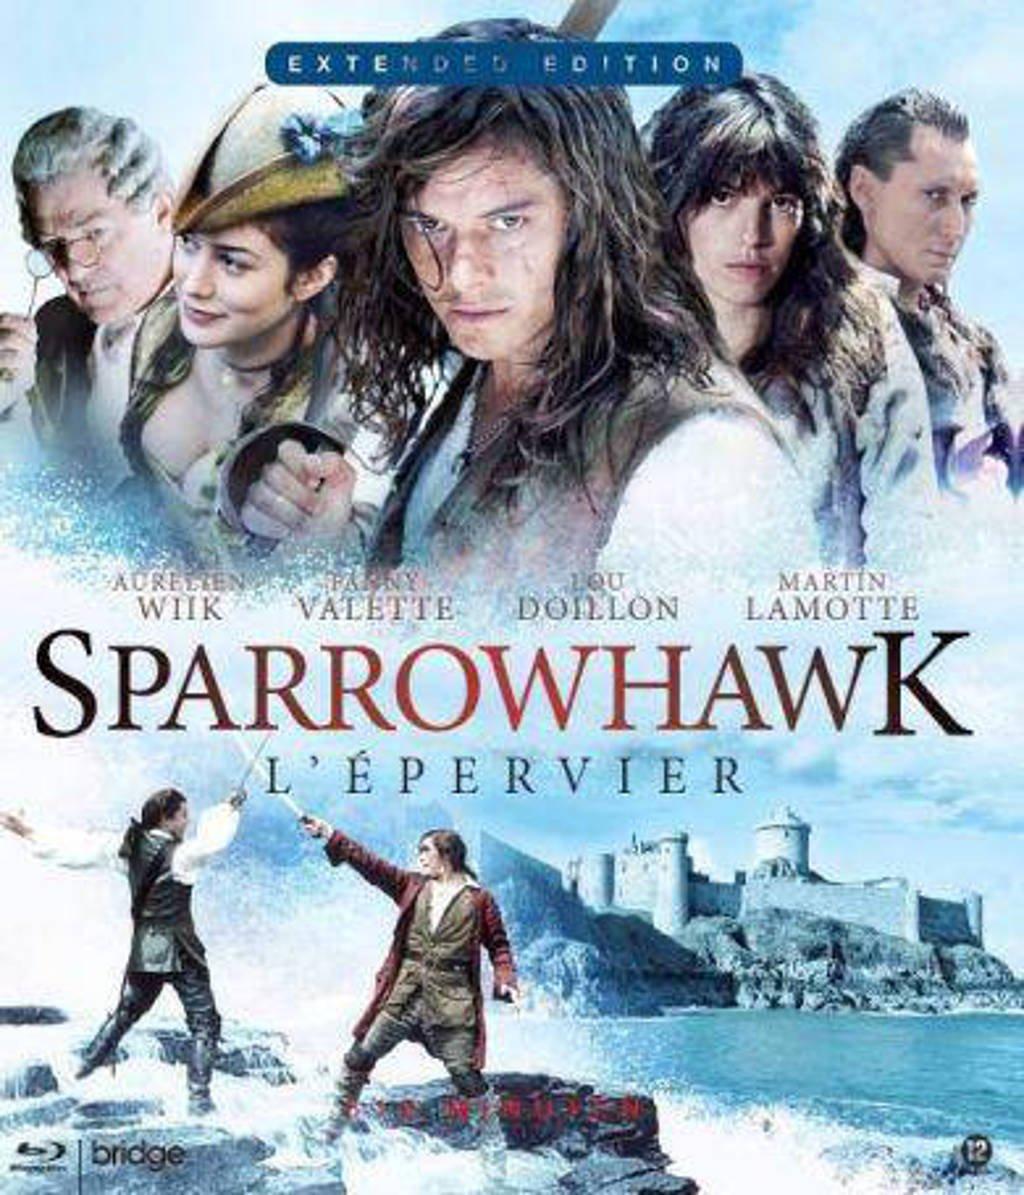 Sparrowhawk (Blu-ray)